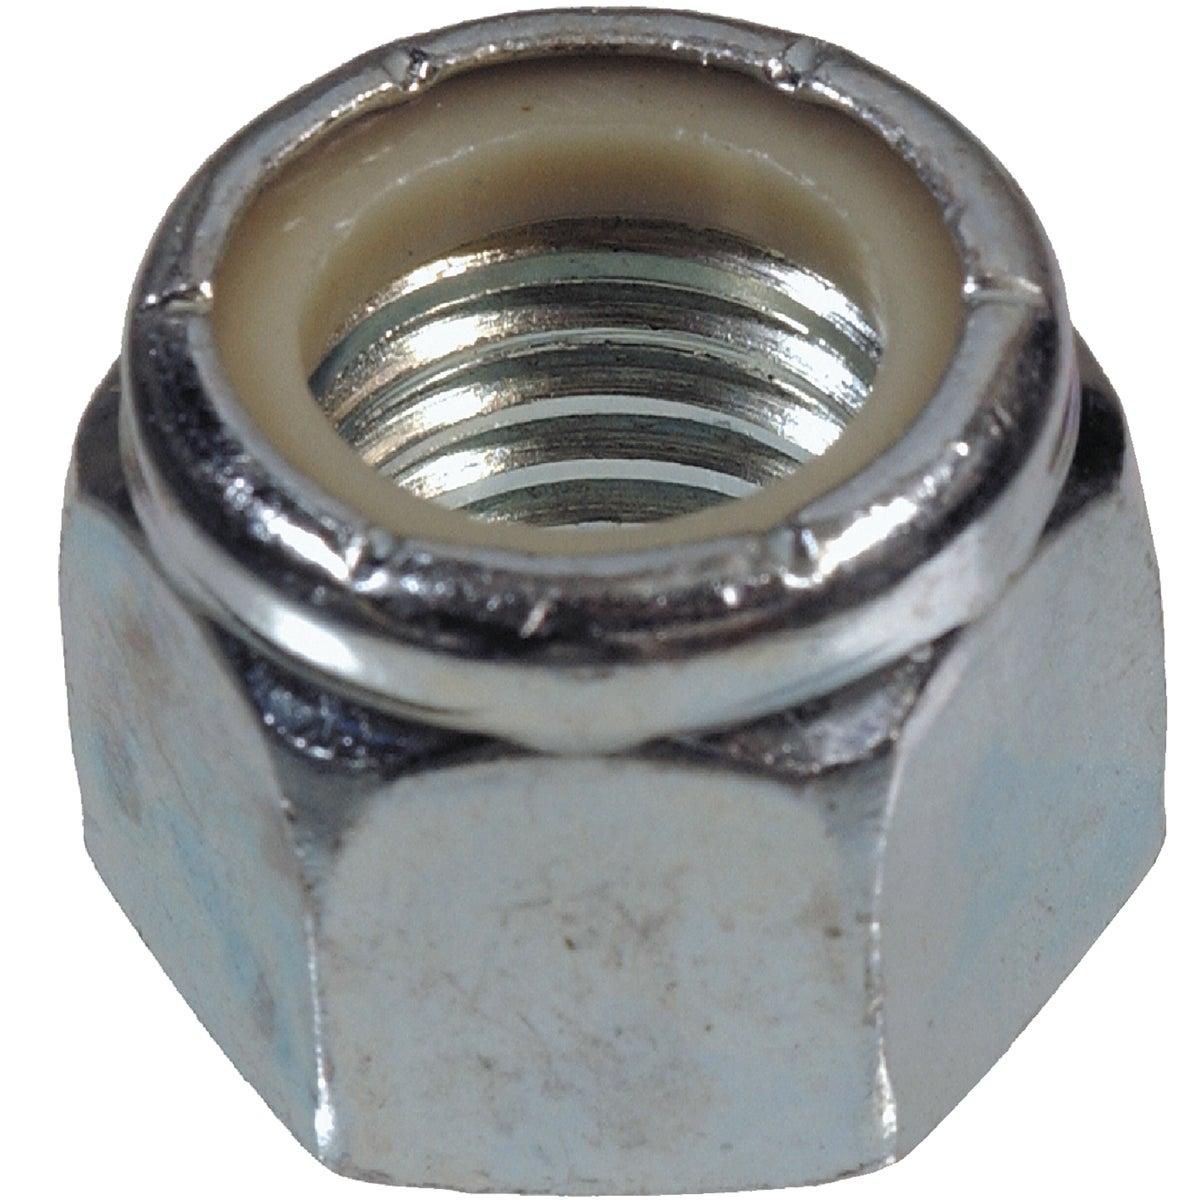 8-32 NYL INSERT LOCK NUT - 180138 by Hillman Fastener